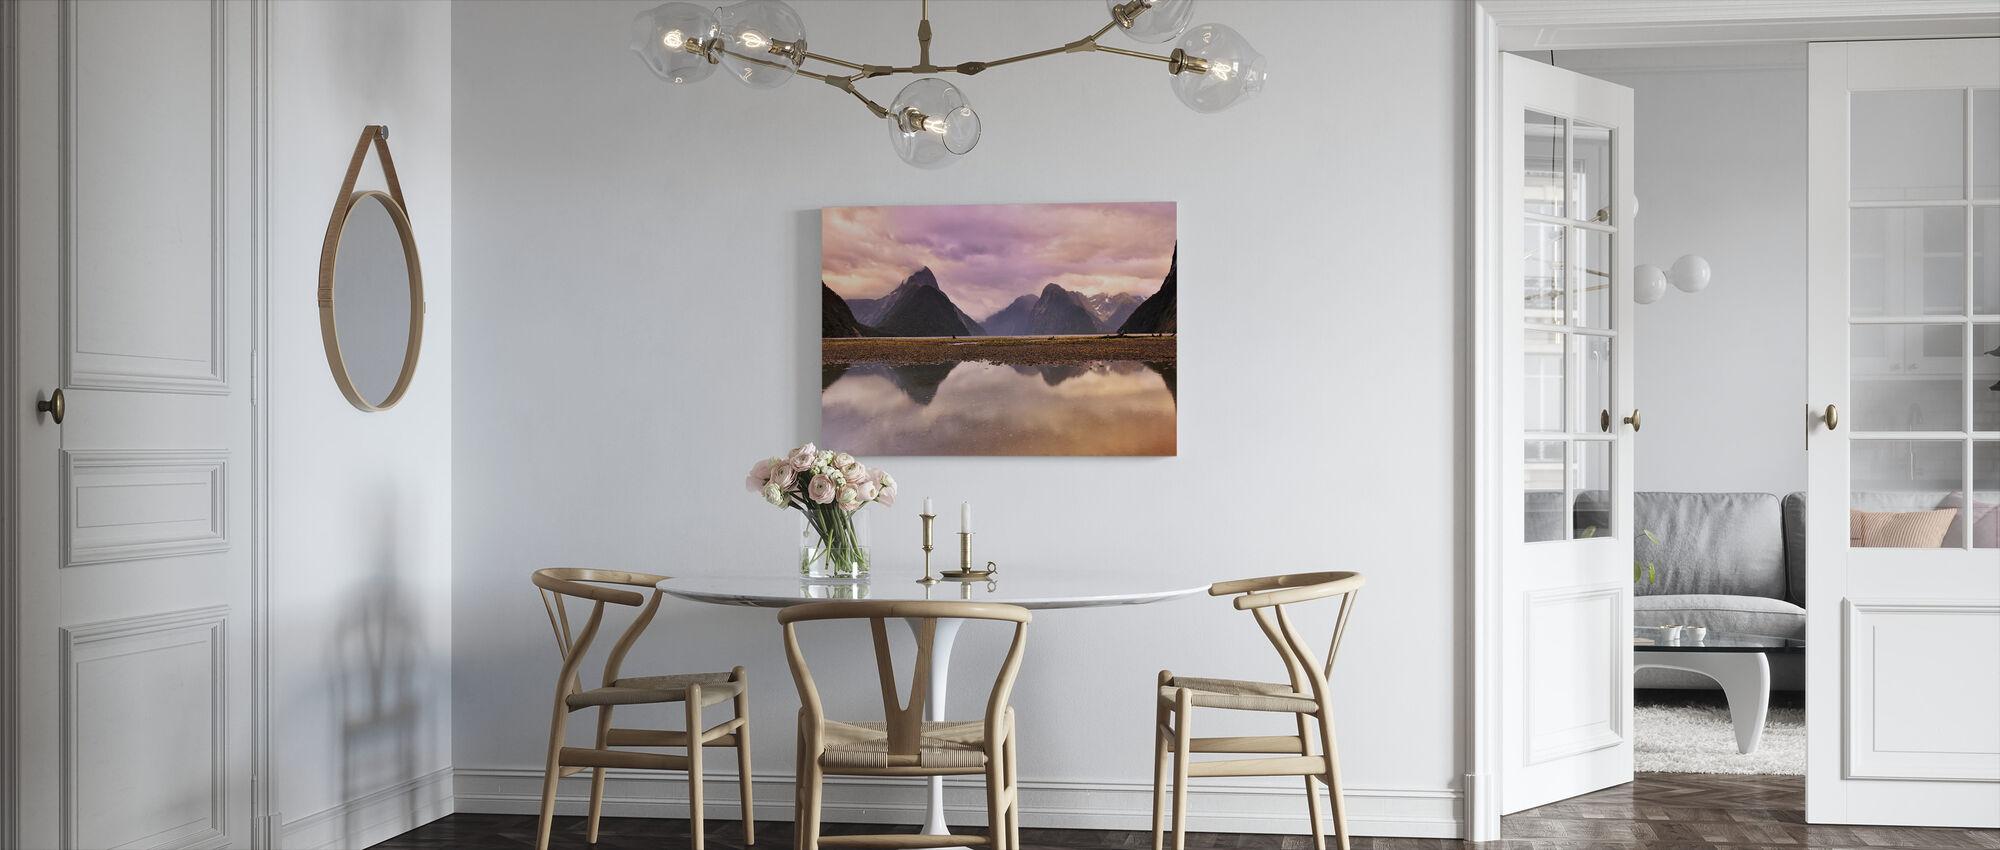 Hazy Reflections - Canvas print - Kitchen